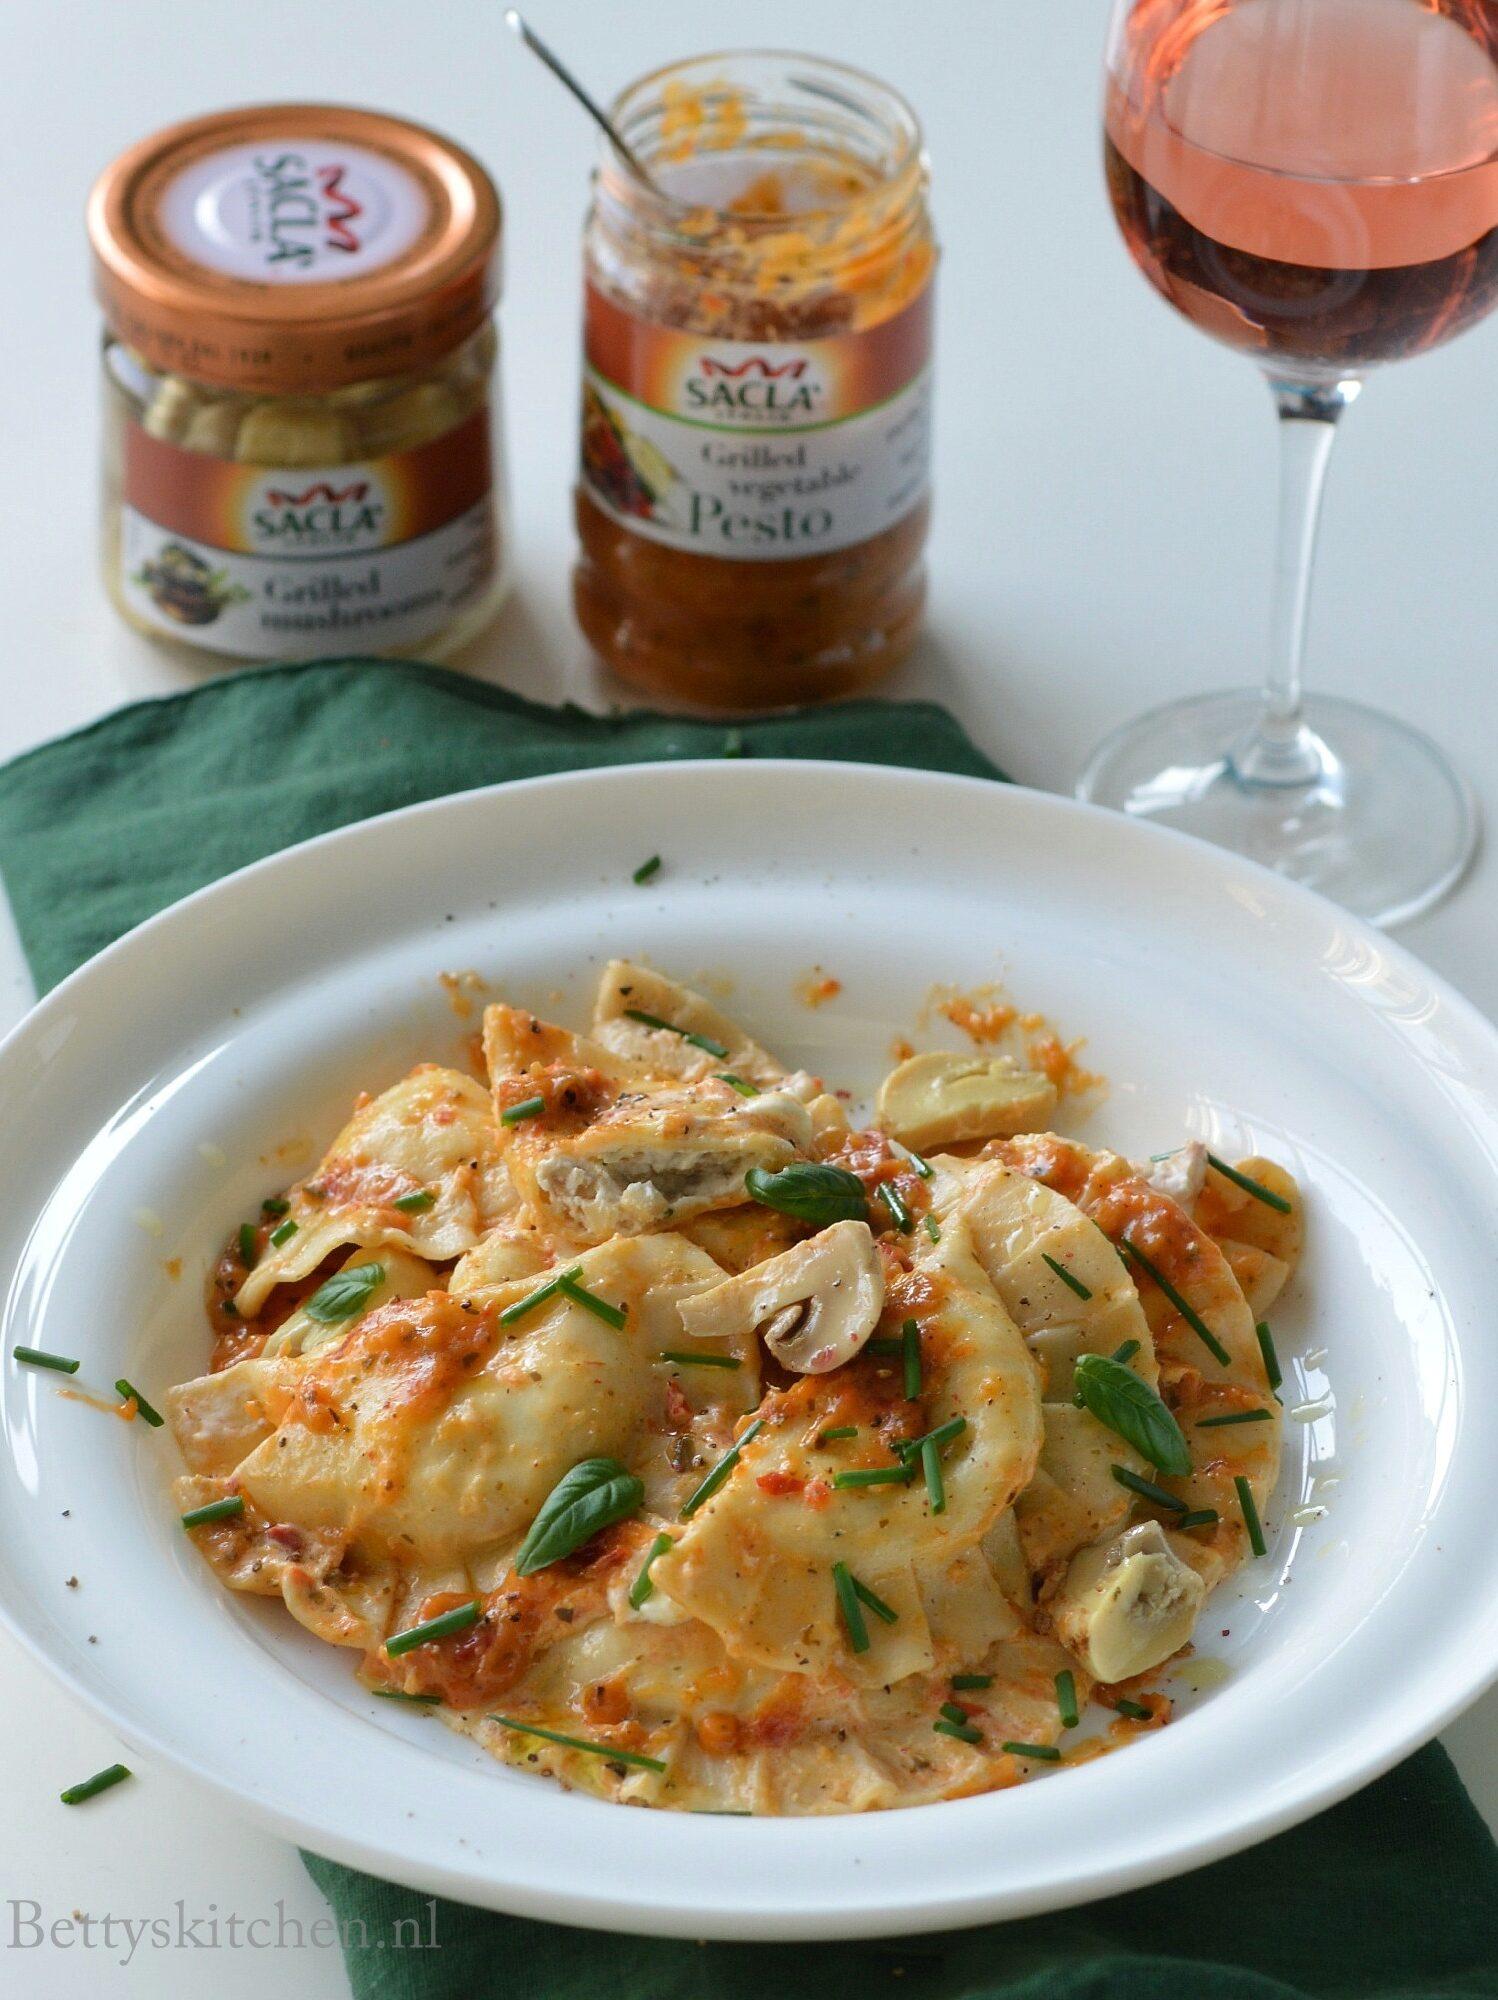 10x Vegetarische Pasta Recepten -ravioli met champignons en pesto saus sacla pasta betty's kitchen